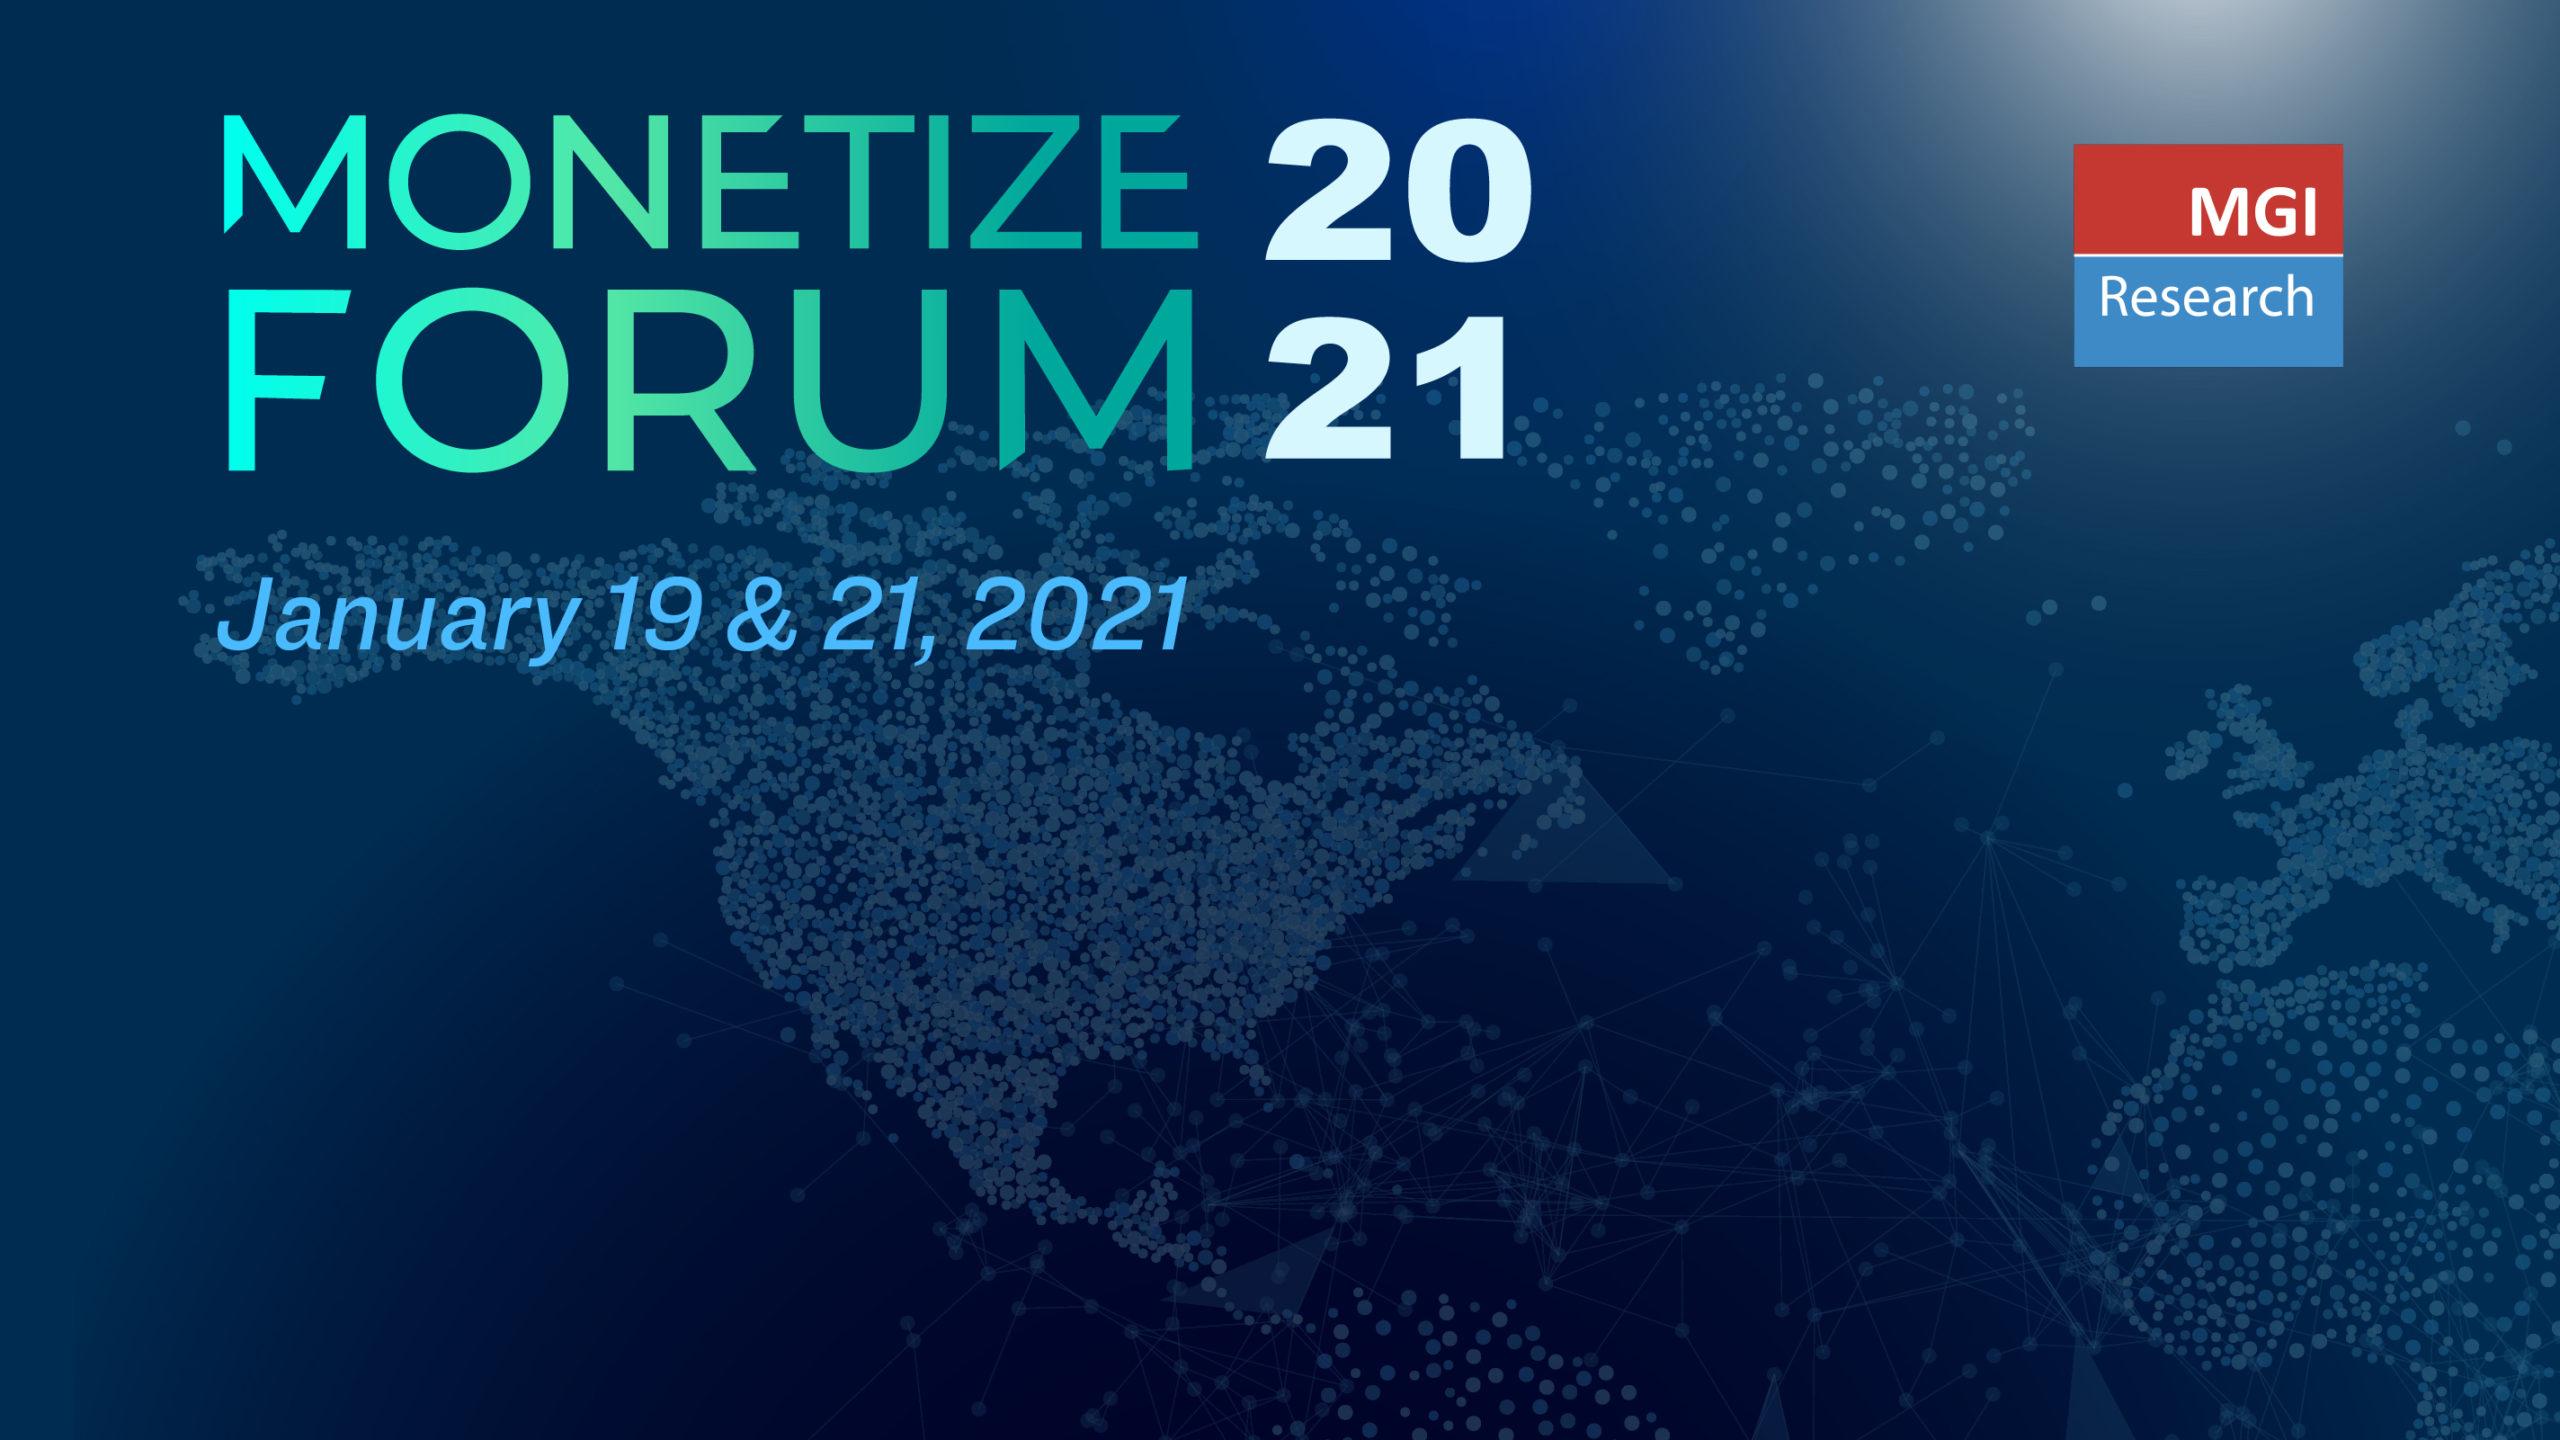 MGI-Monetize-Forum-hubilo @2x